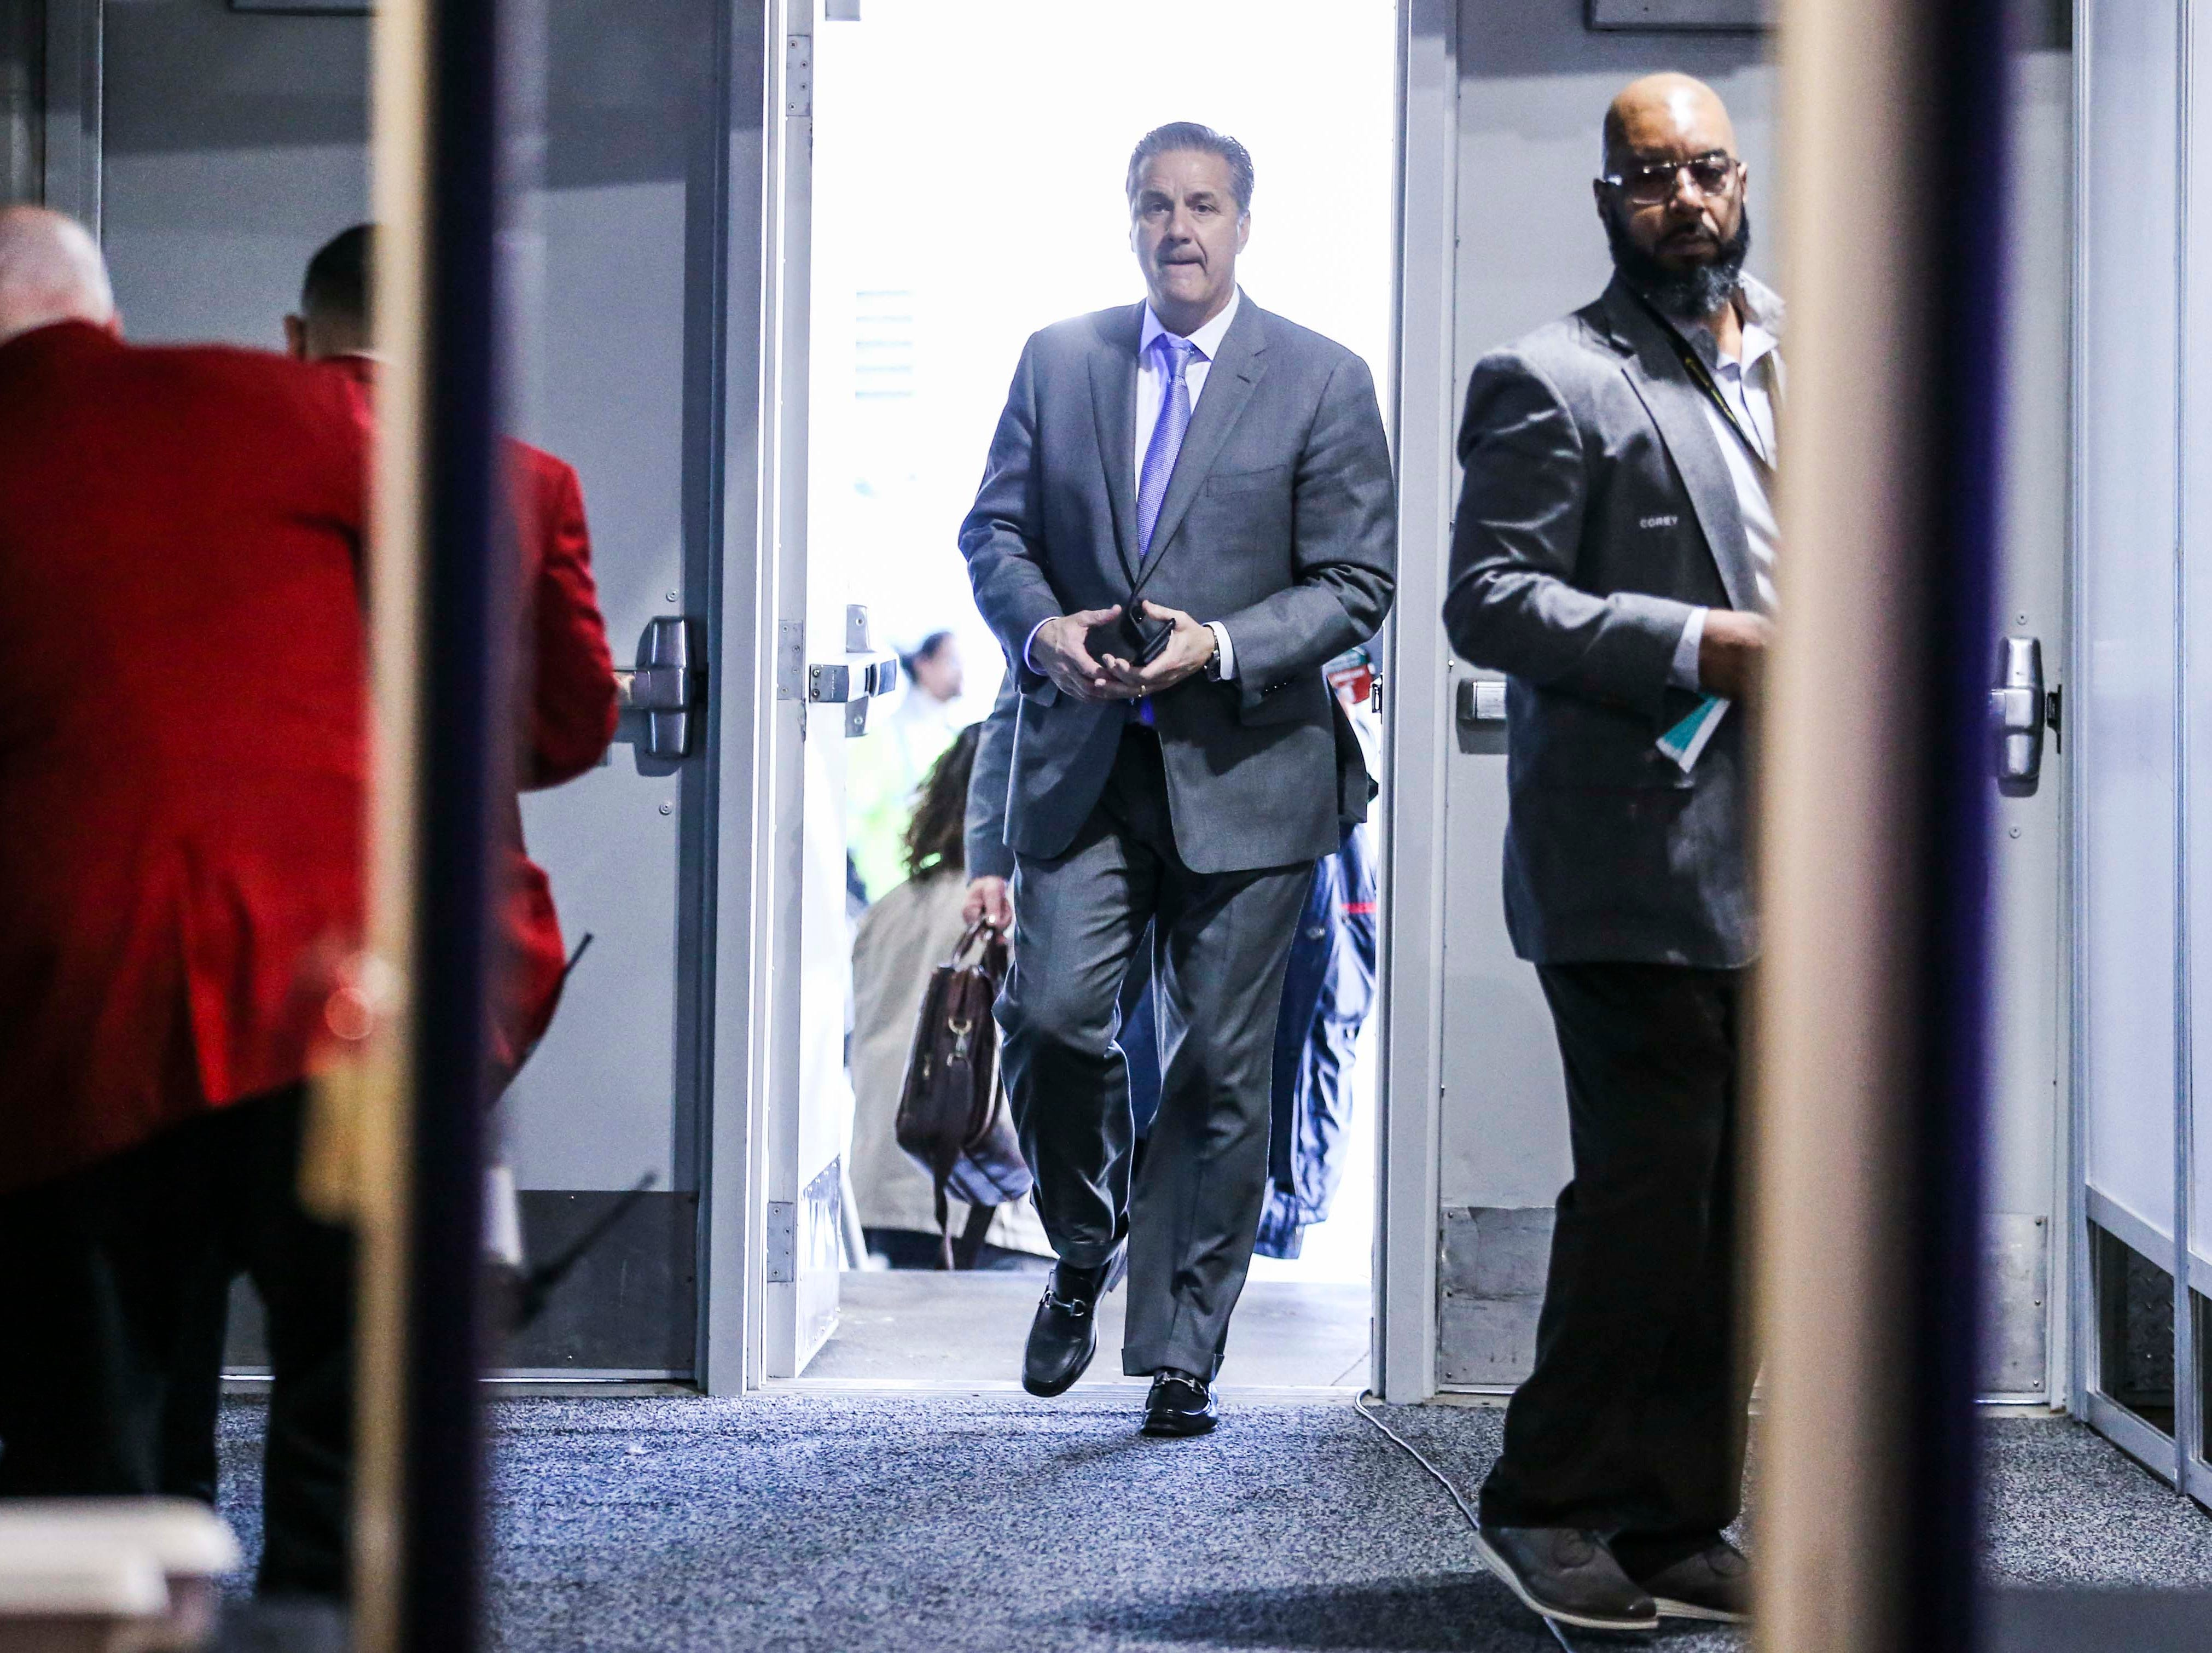 Kentucky coach John Calipari arrives at the Sprint Center in Kansas City. March 31, 2019